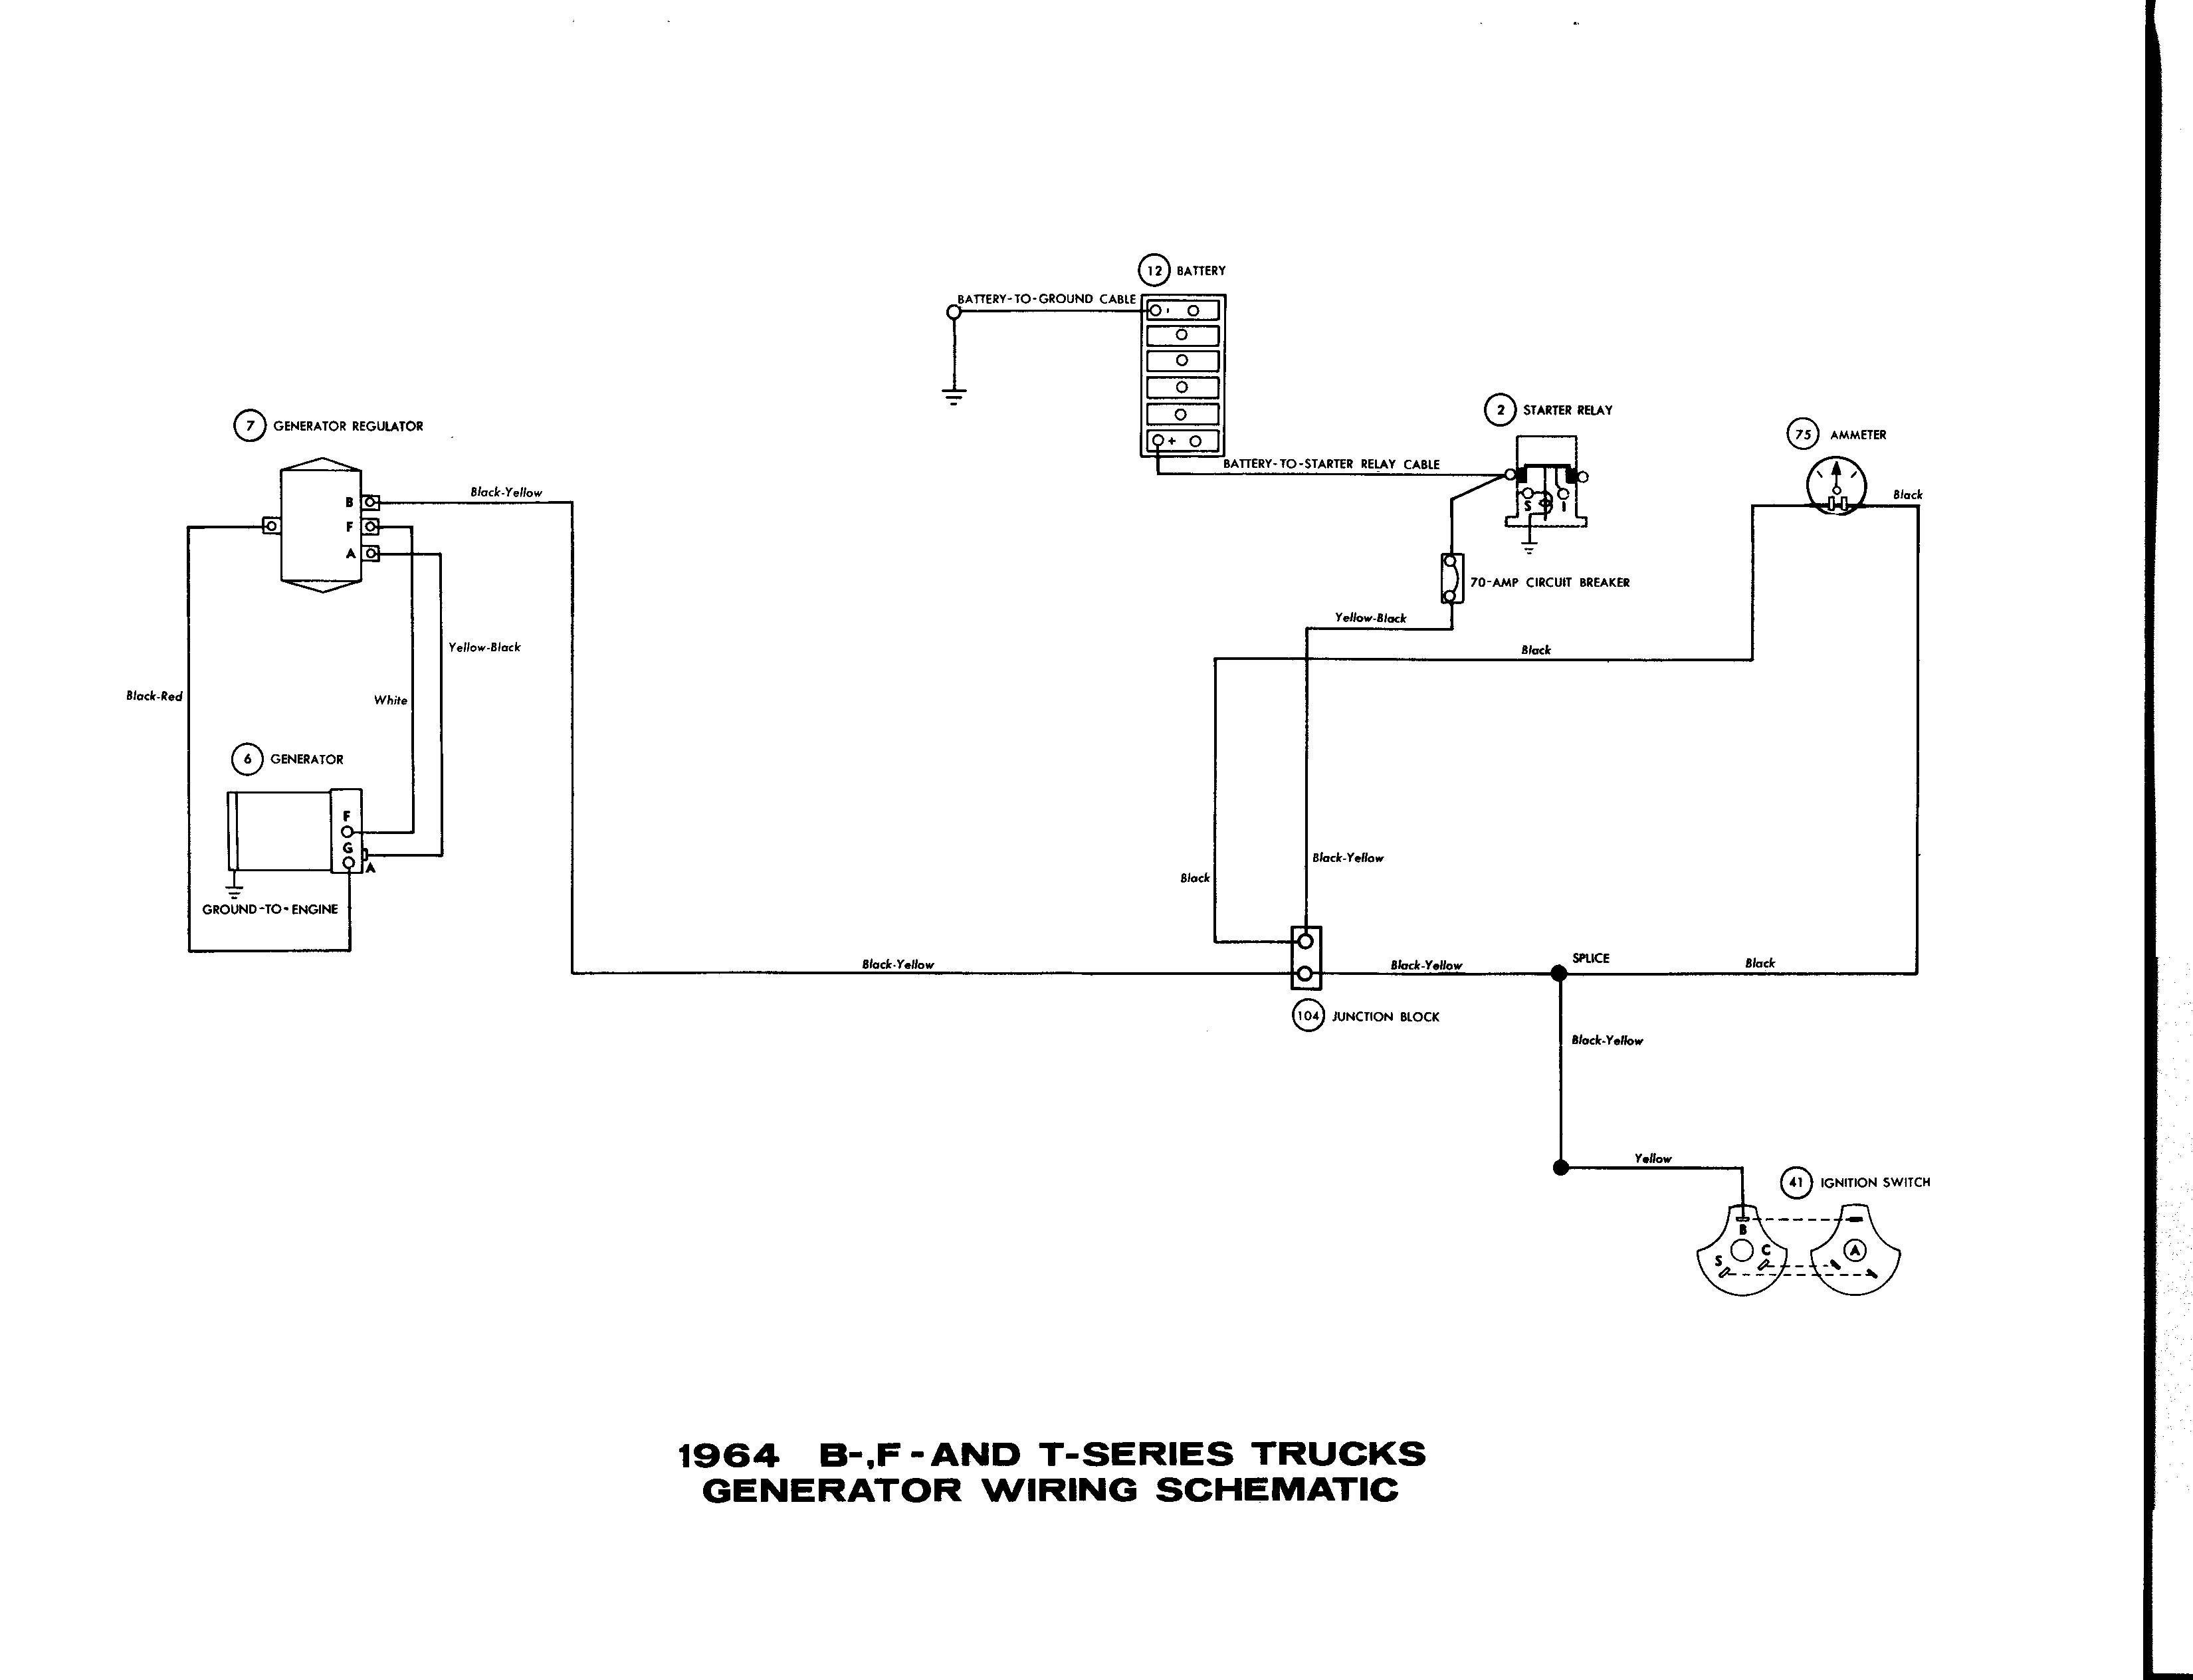 2000 Pontiac Montana Engine Diagram My Wiring Alternator Ls1 New Ls2 Save Rh Ipphil